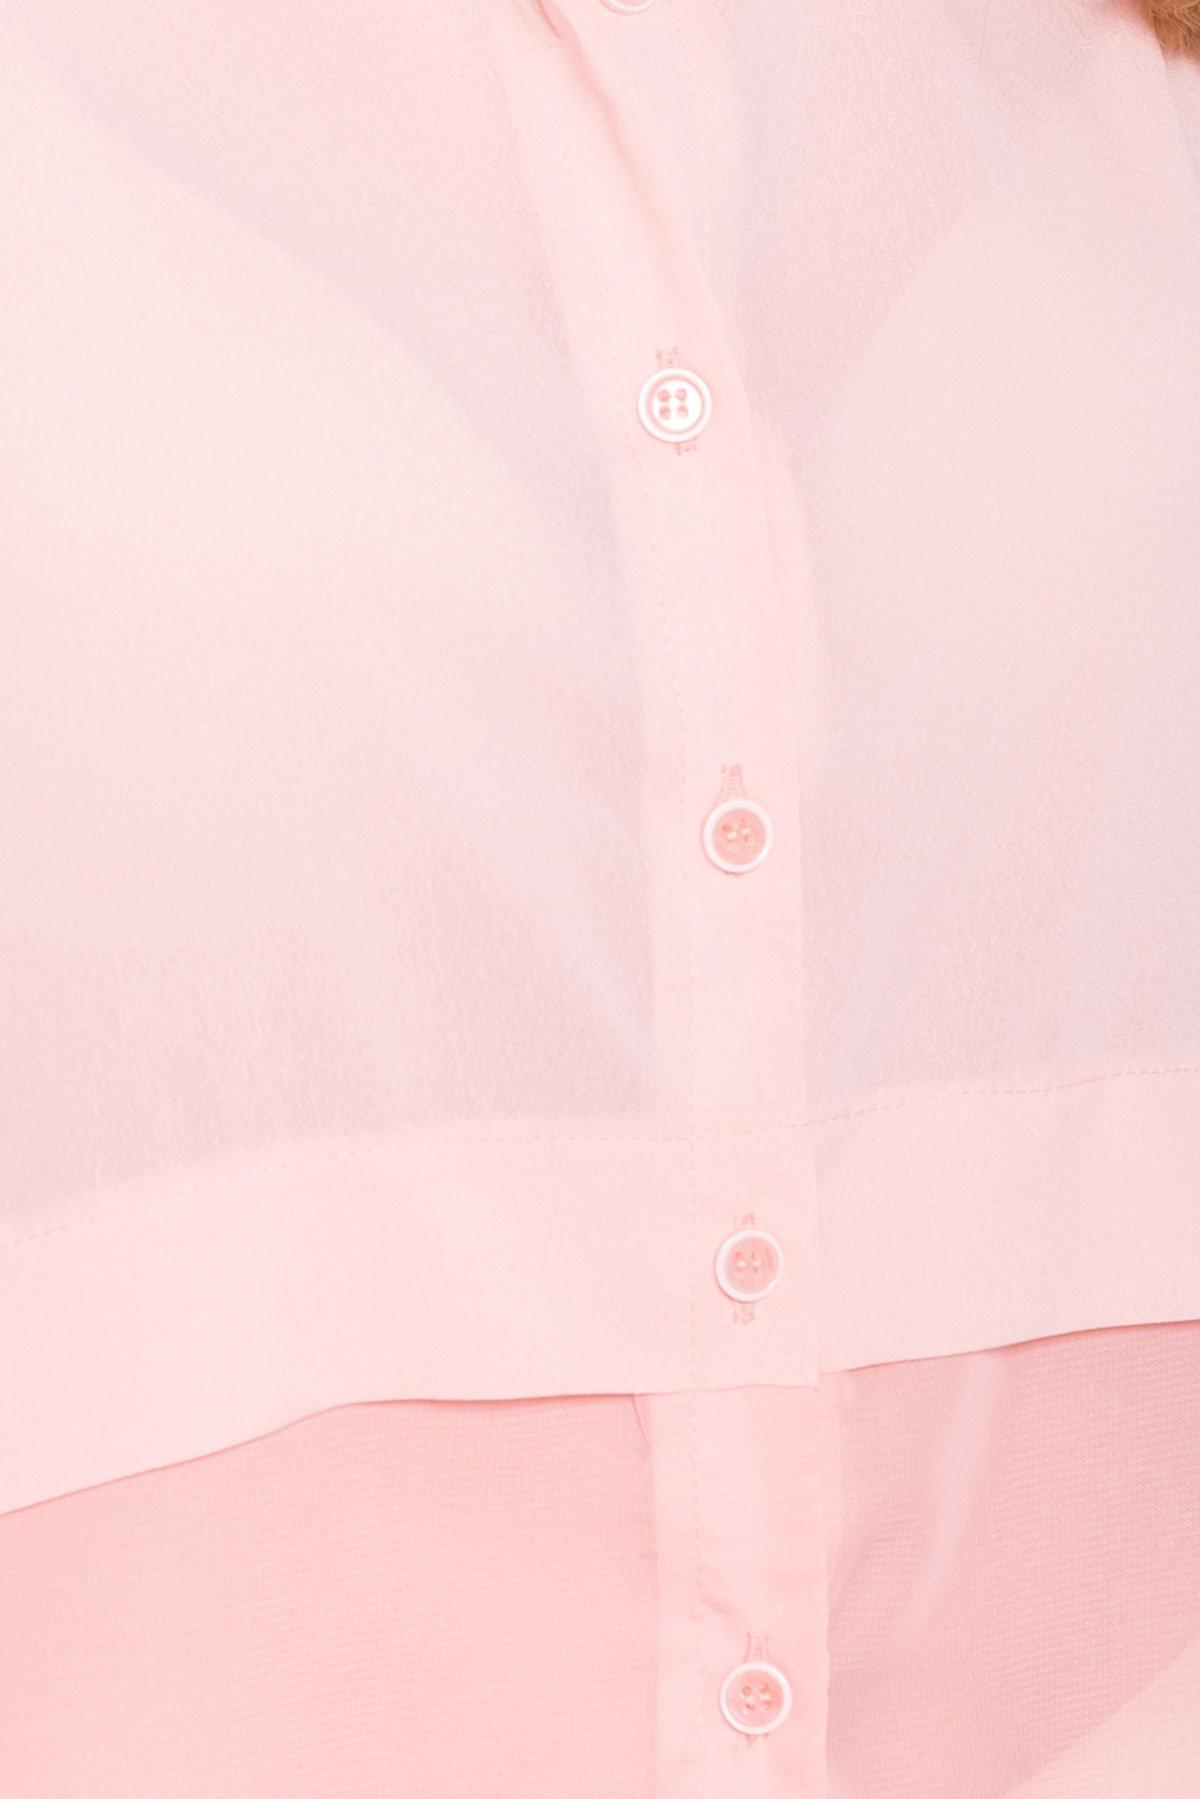 Рубашка без рукавов Дива 7532 АРТ. 43438 Цвет: Персик - фото 4, интернет магазин tm-modus.ru